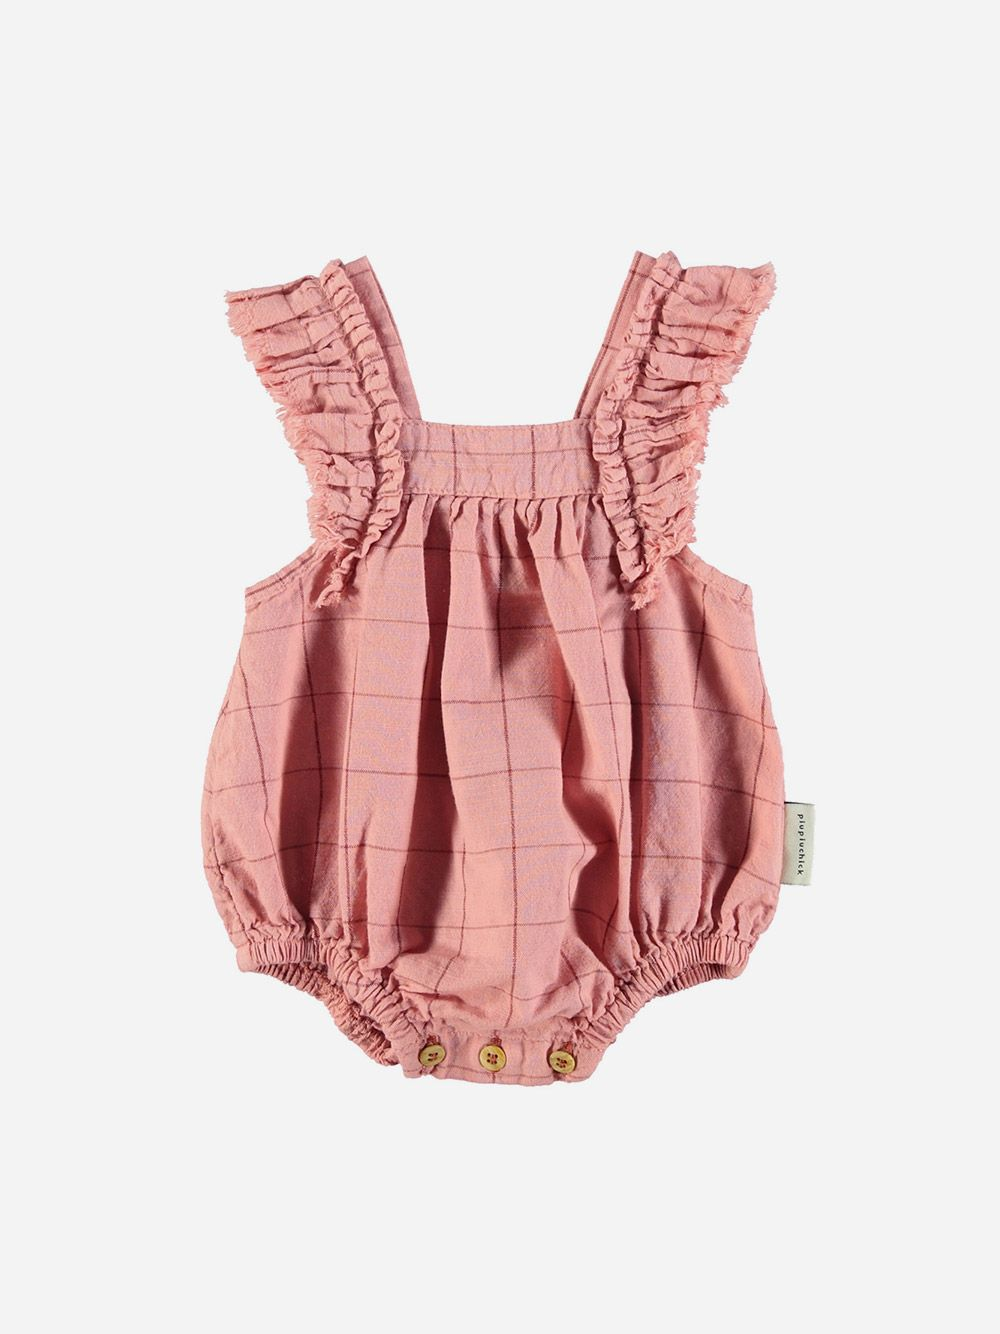 Baby Romper with Fringe Straps Vintage Pink & Garnet Checkered